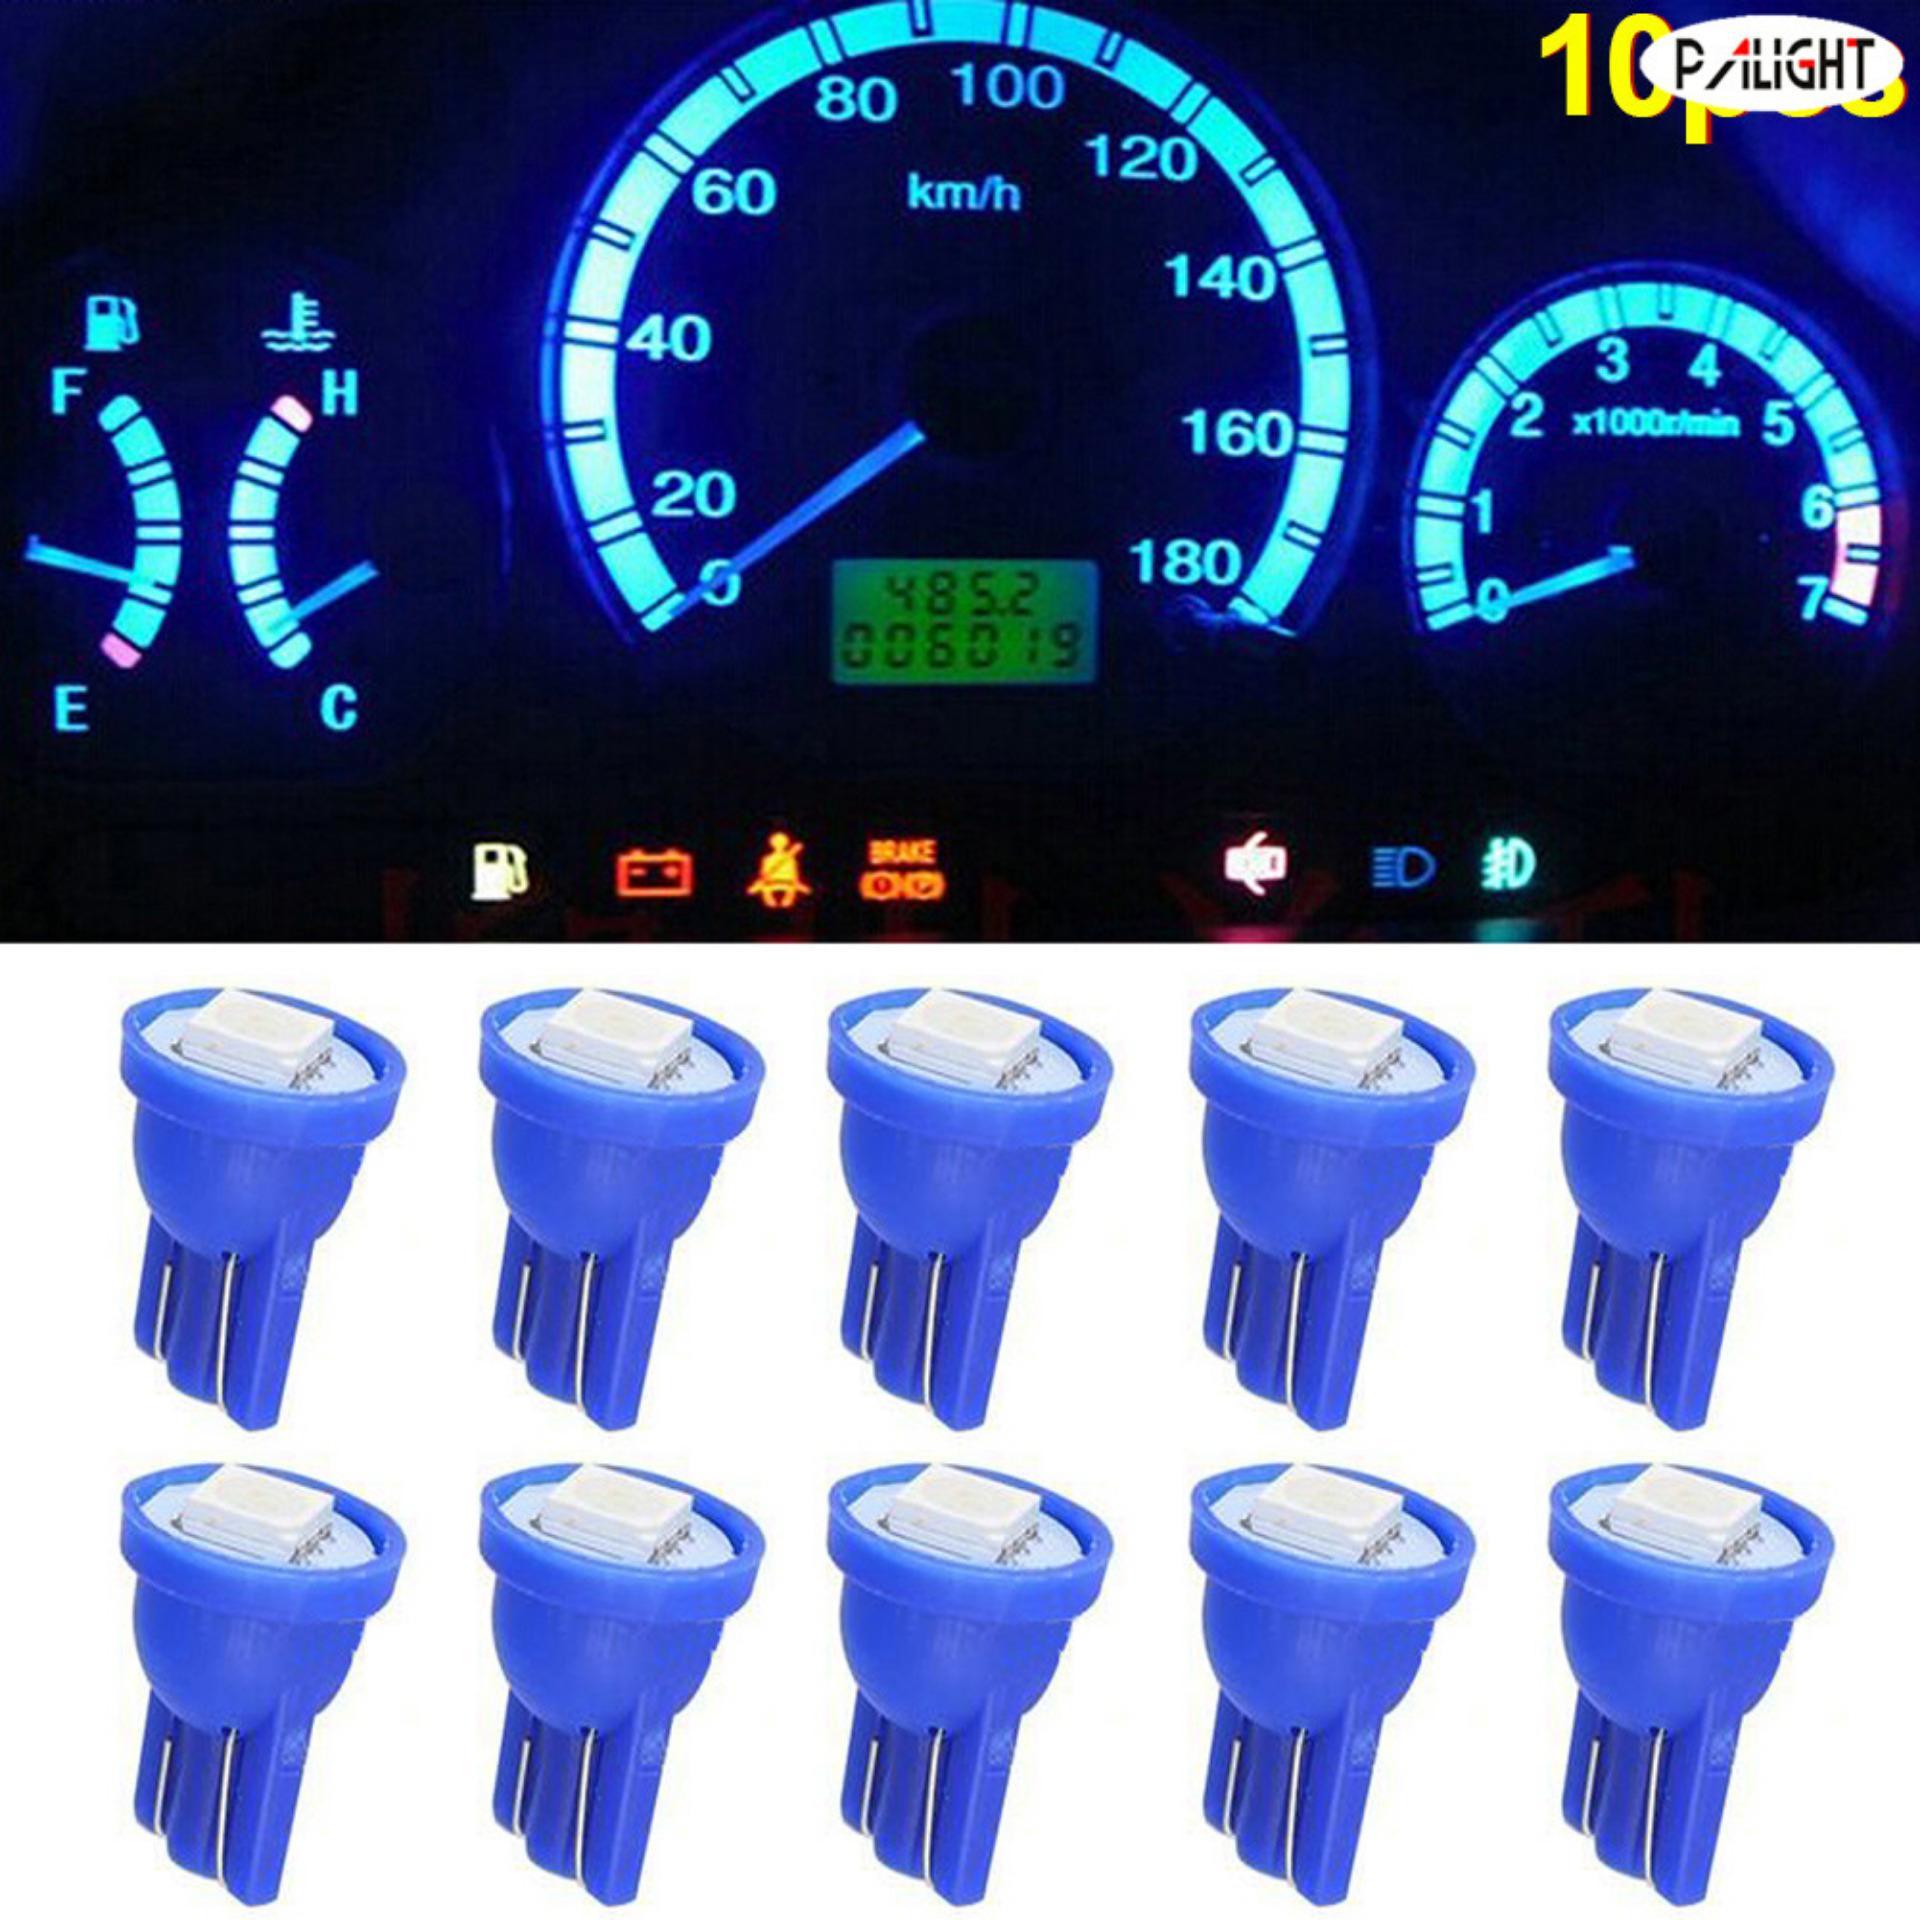 PAlight 10pcs T10 Wedge 5050 SMD Car LED Gauge Cluster Lights 147 152 Speedometer Lamps -